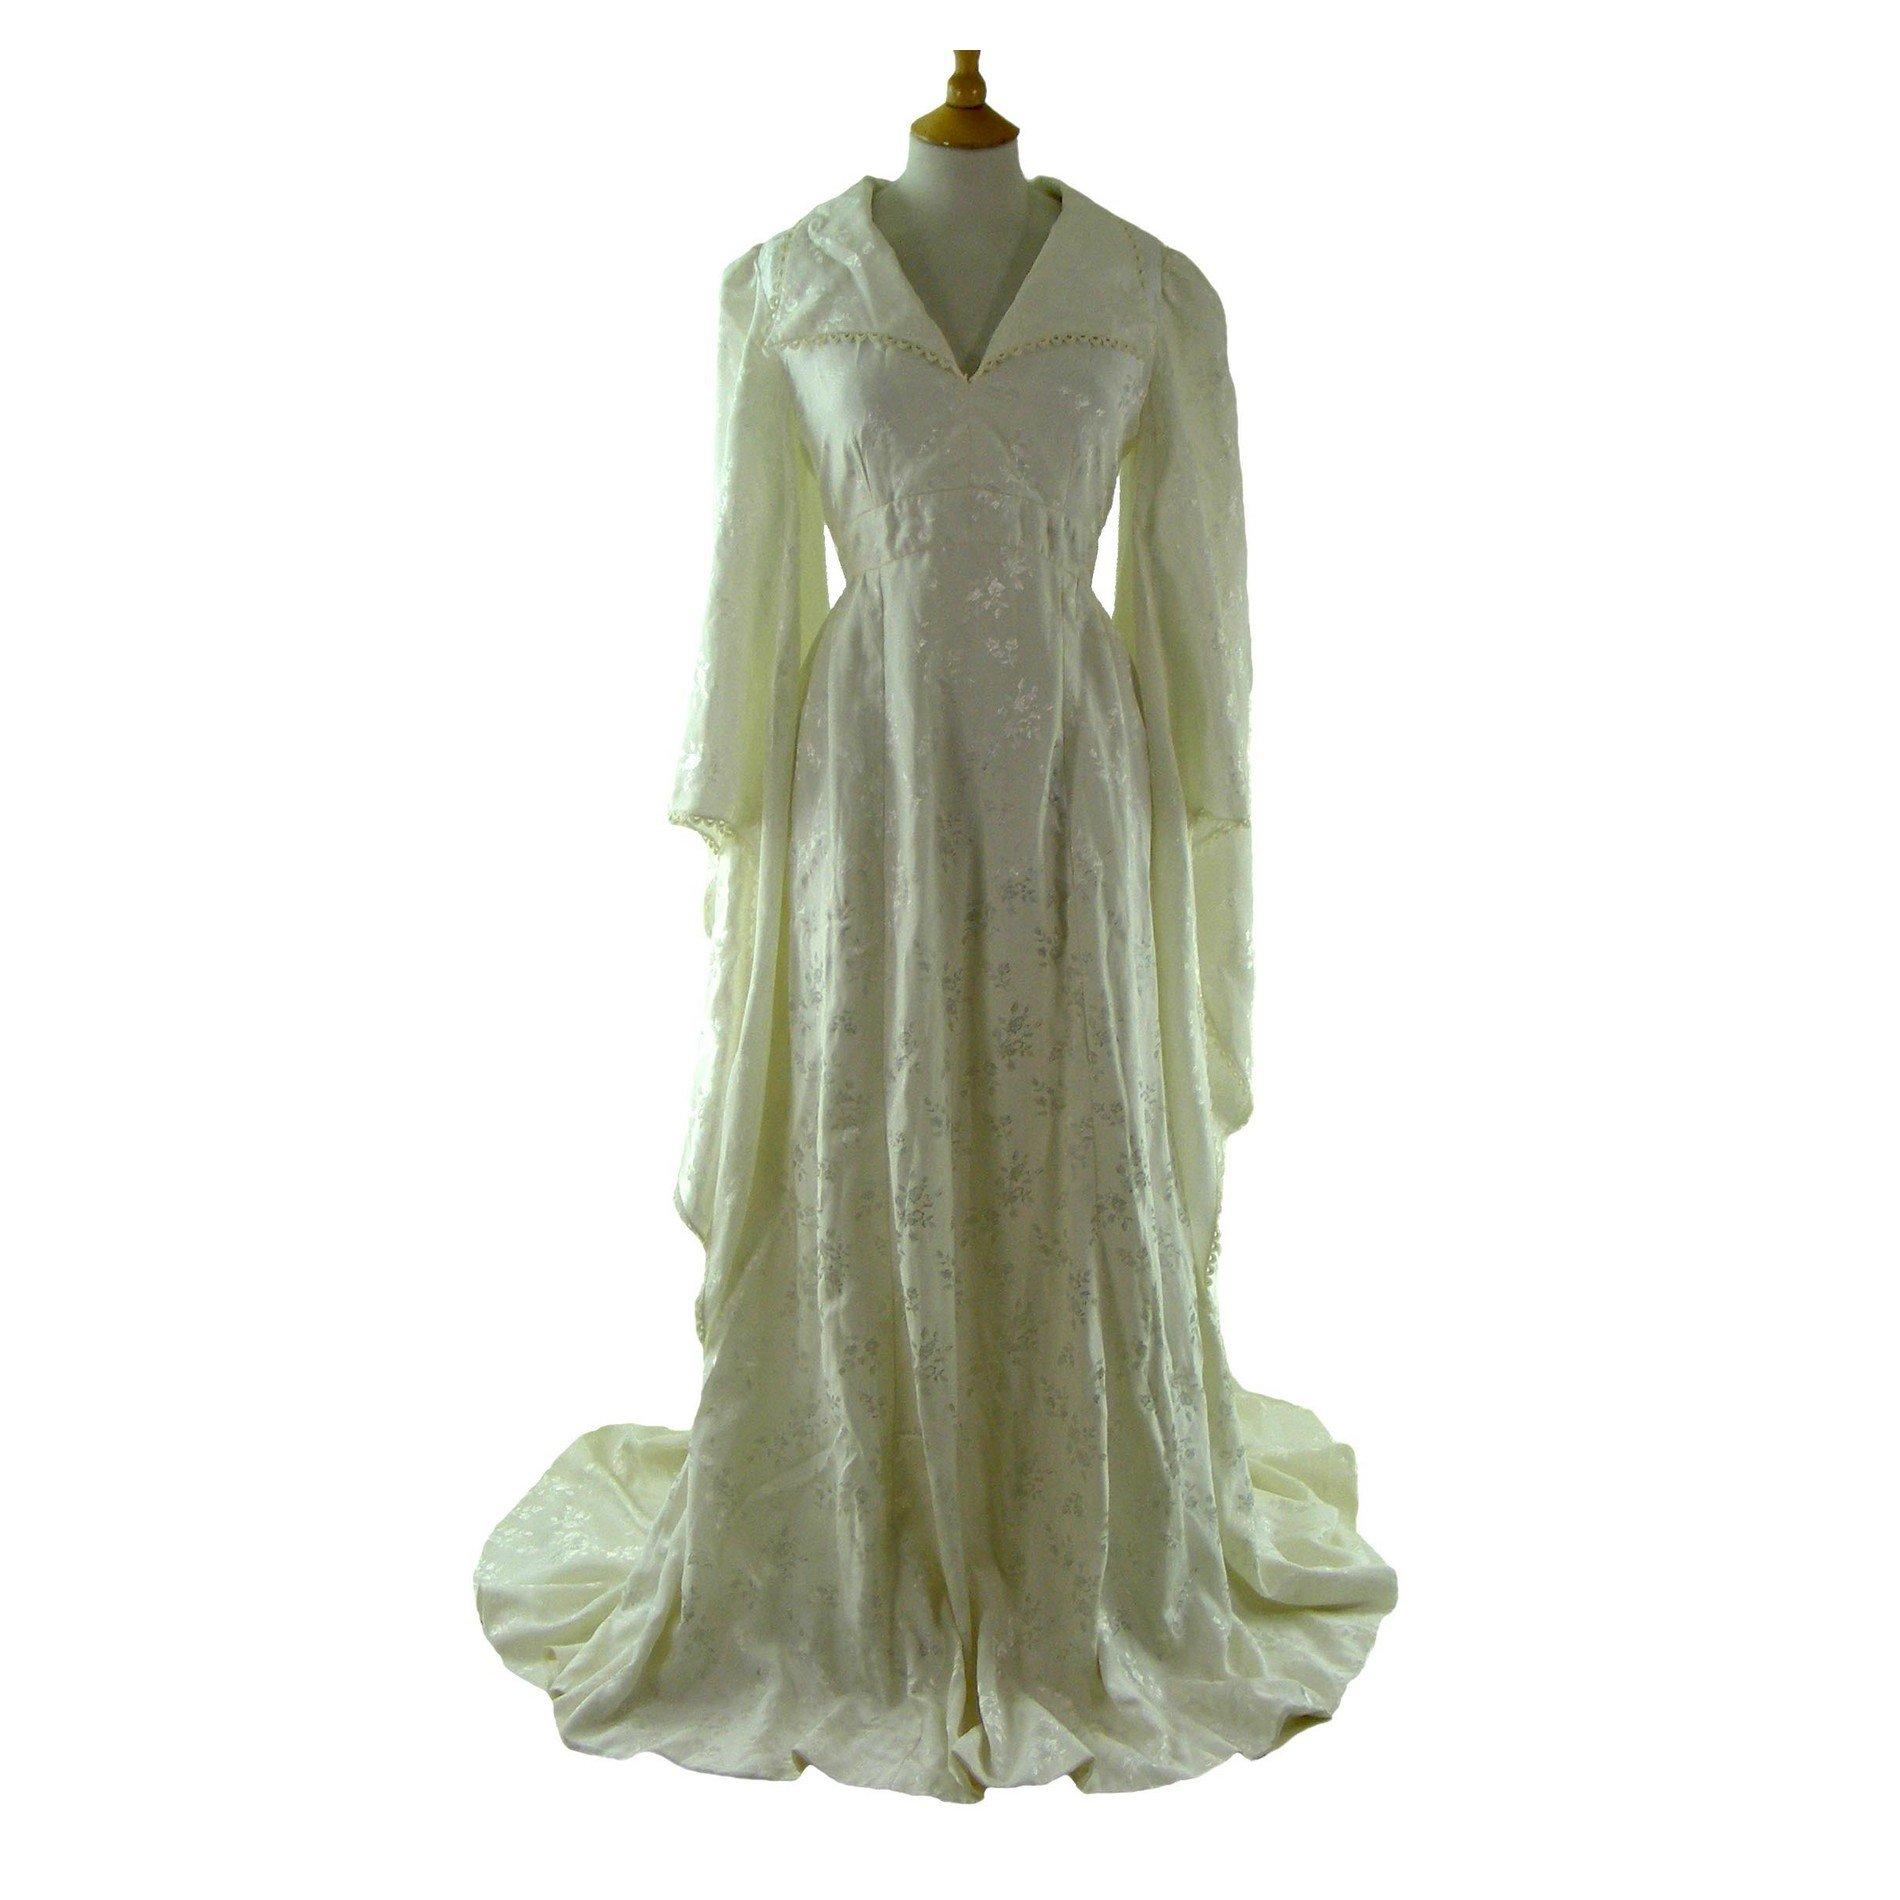 1960s Satin Wedding Dress Vintage Clothing Blue 17